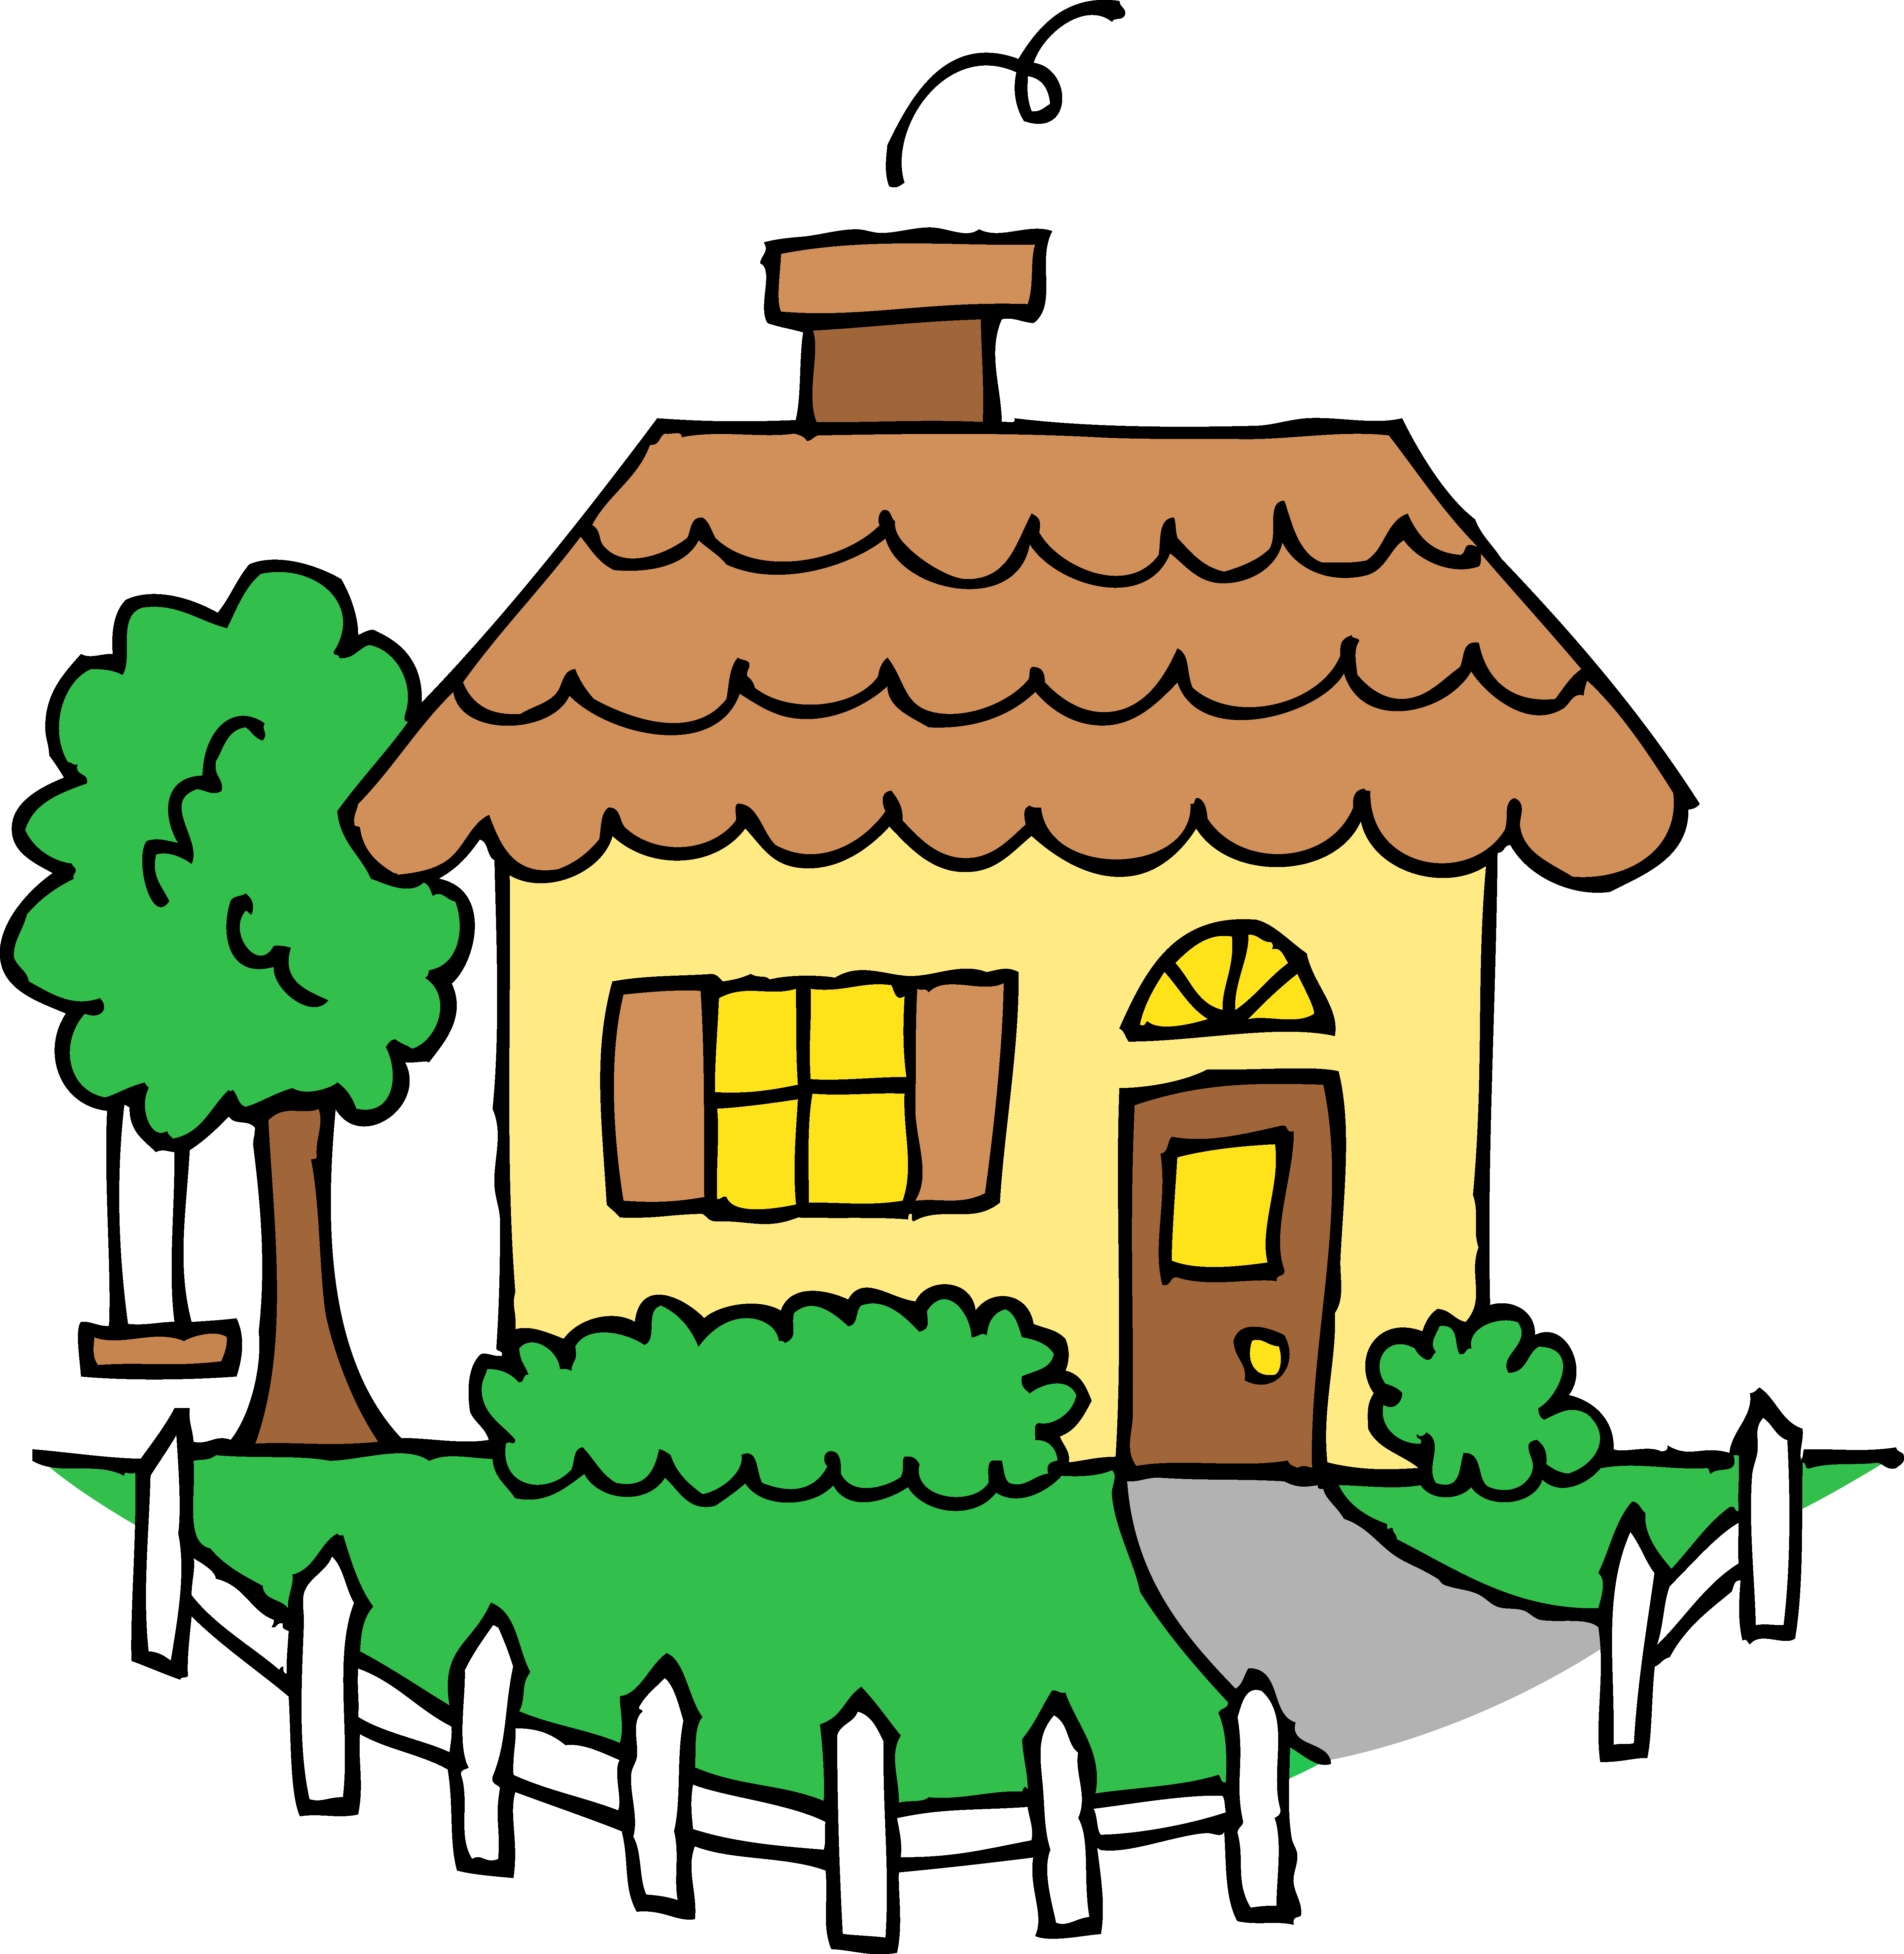 Free House Clipart - clipartall-Free House Clipart - clipartall-3